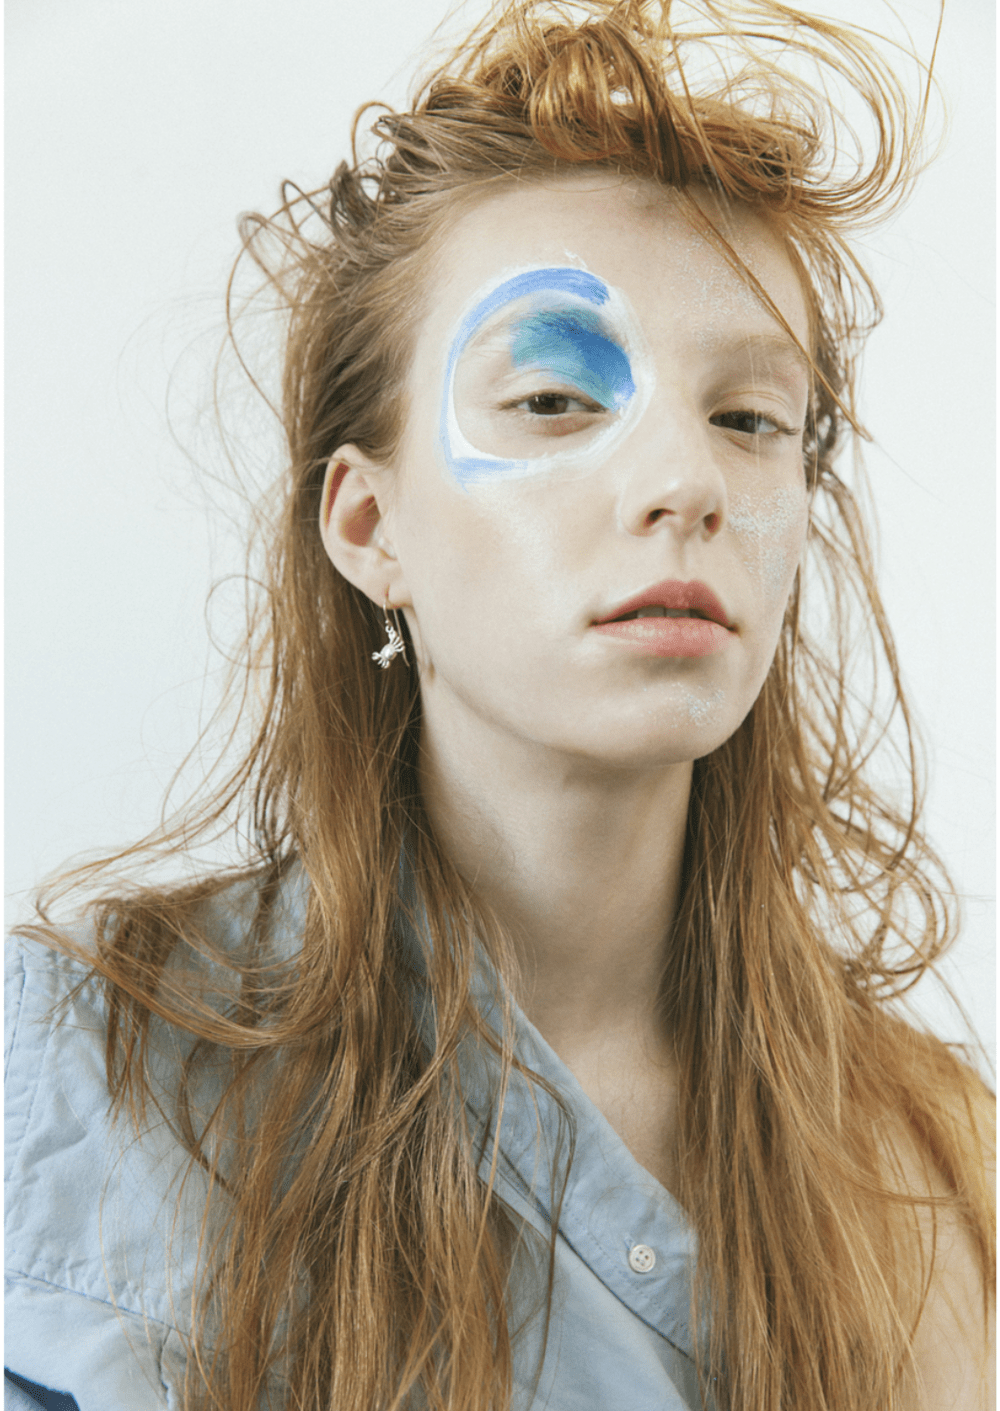 Naomi Wu David Bowie for Vogue Italia